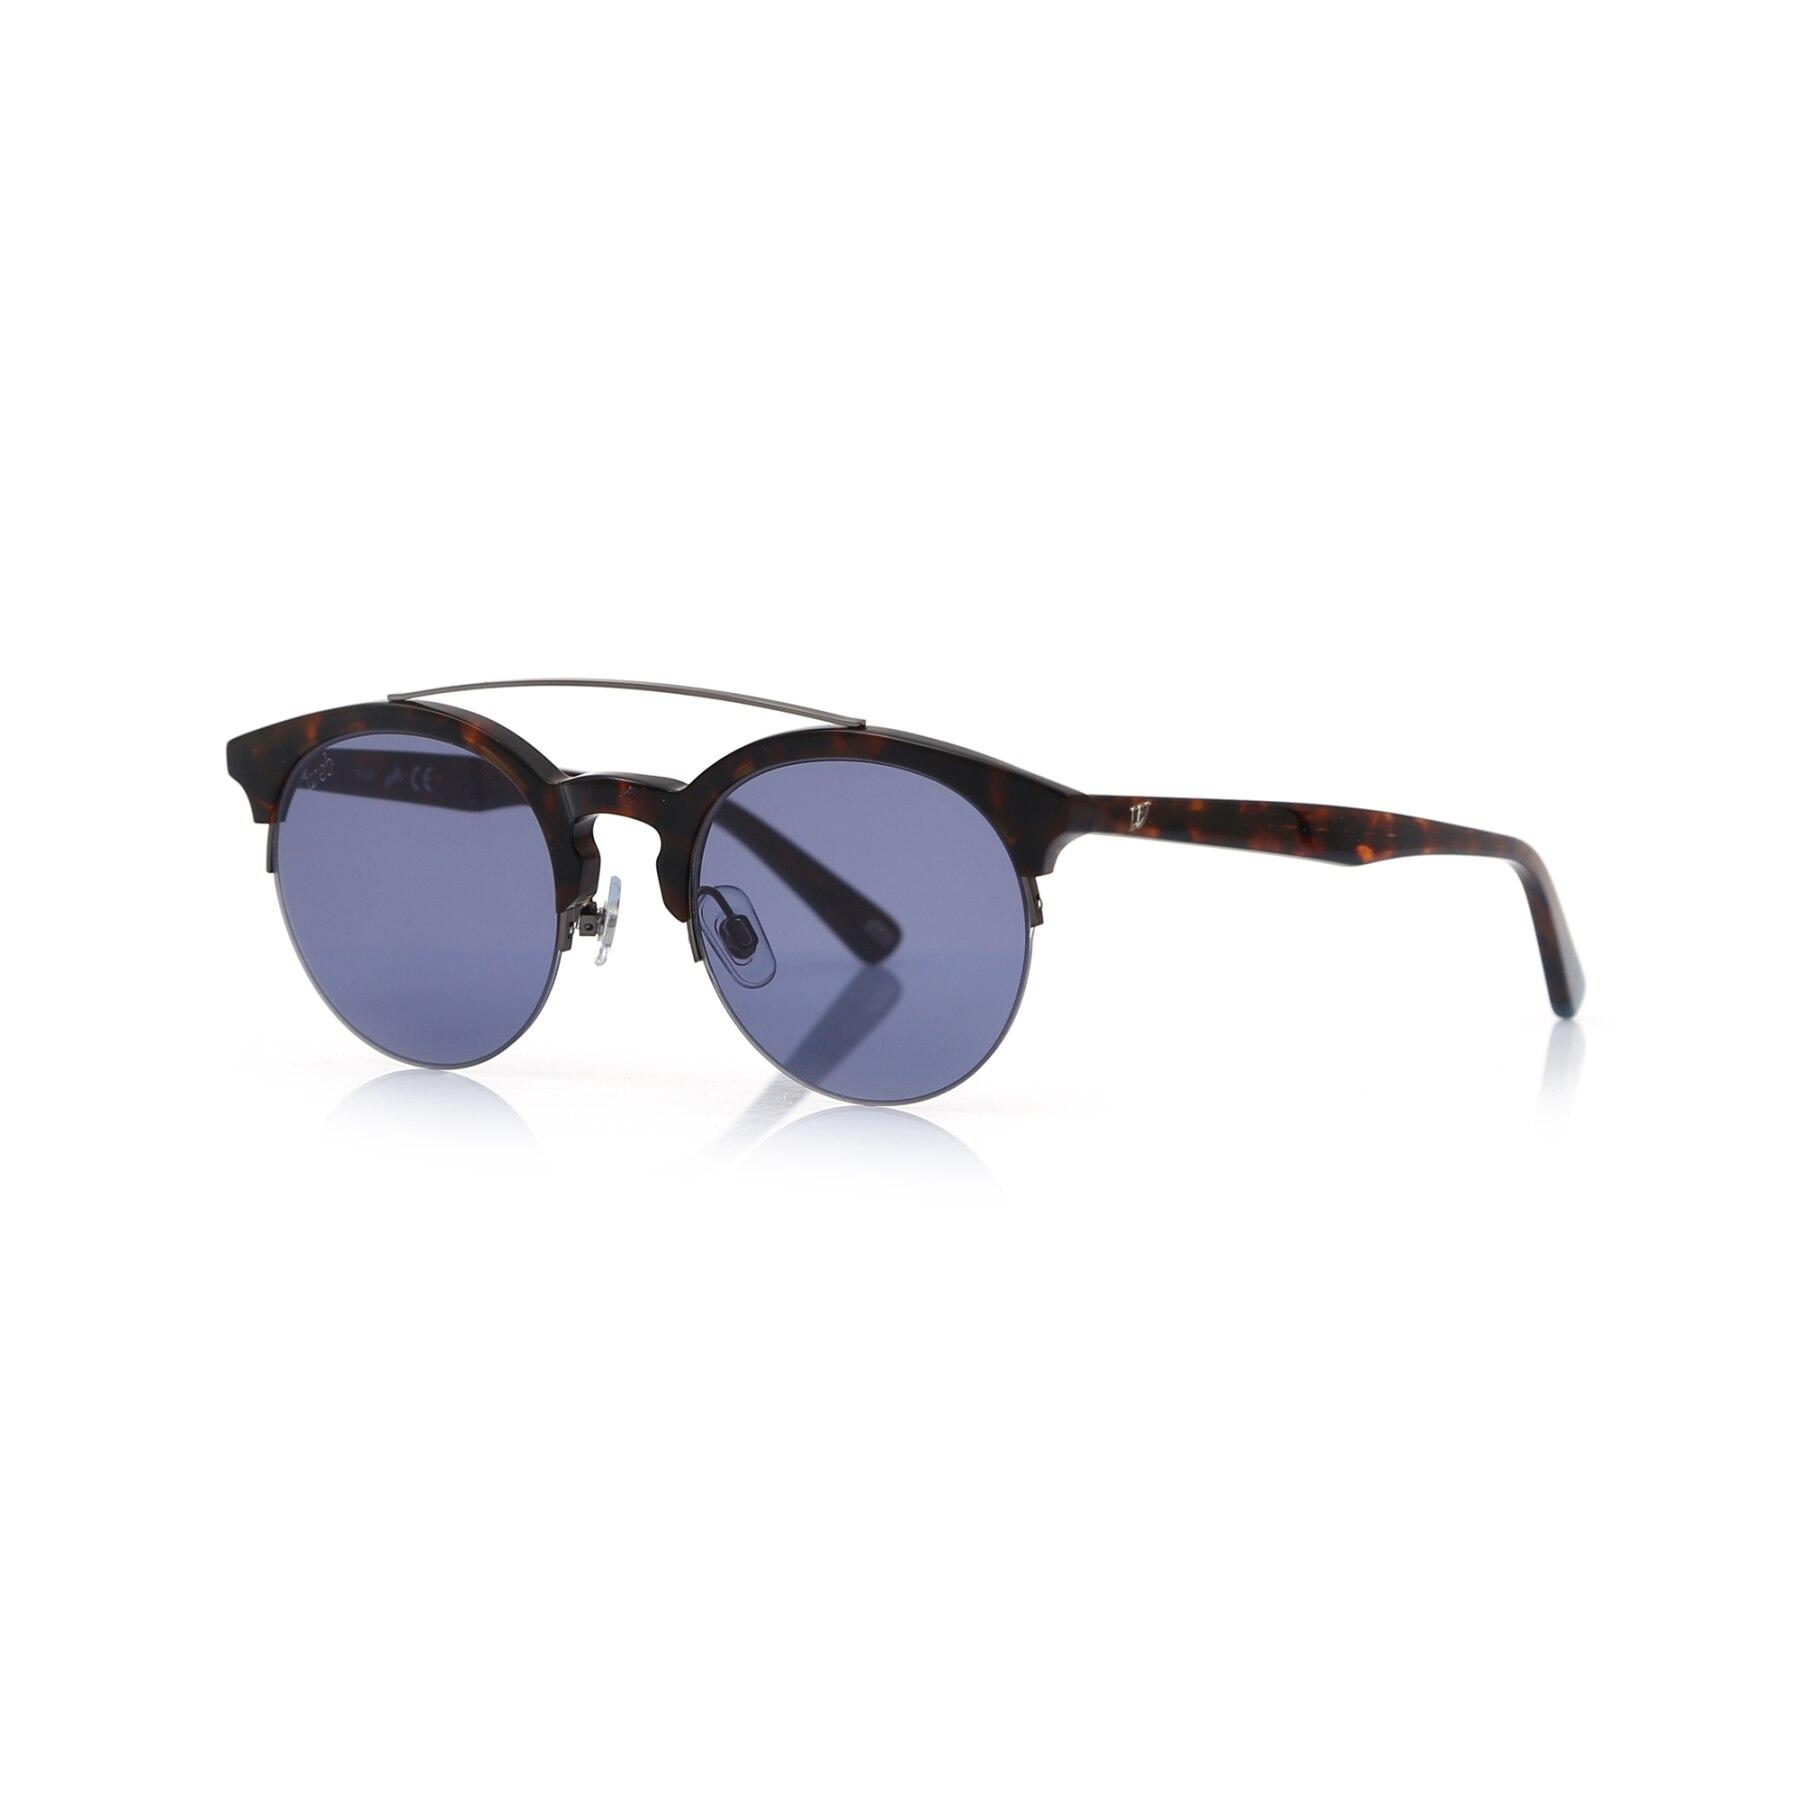 Unisex sunglasses w 0192 52v bone Brown organic oval aval 49-22-145 web